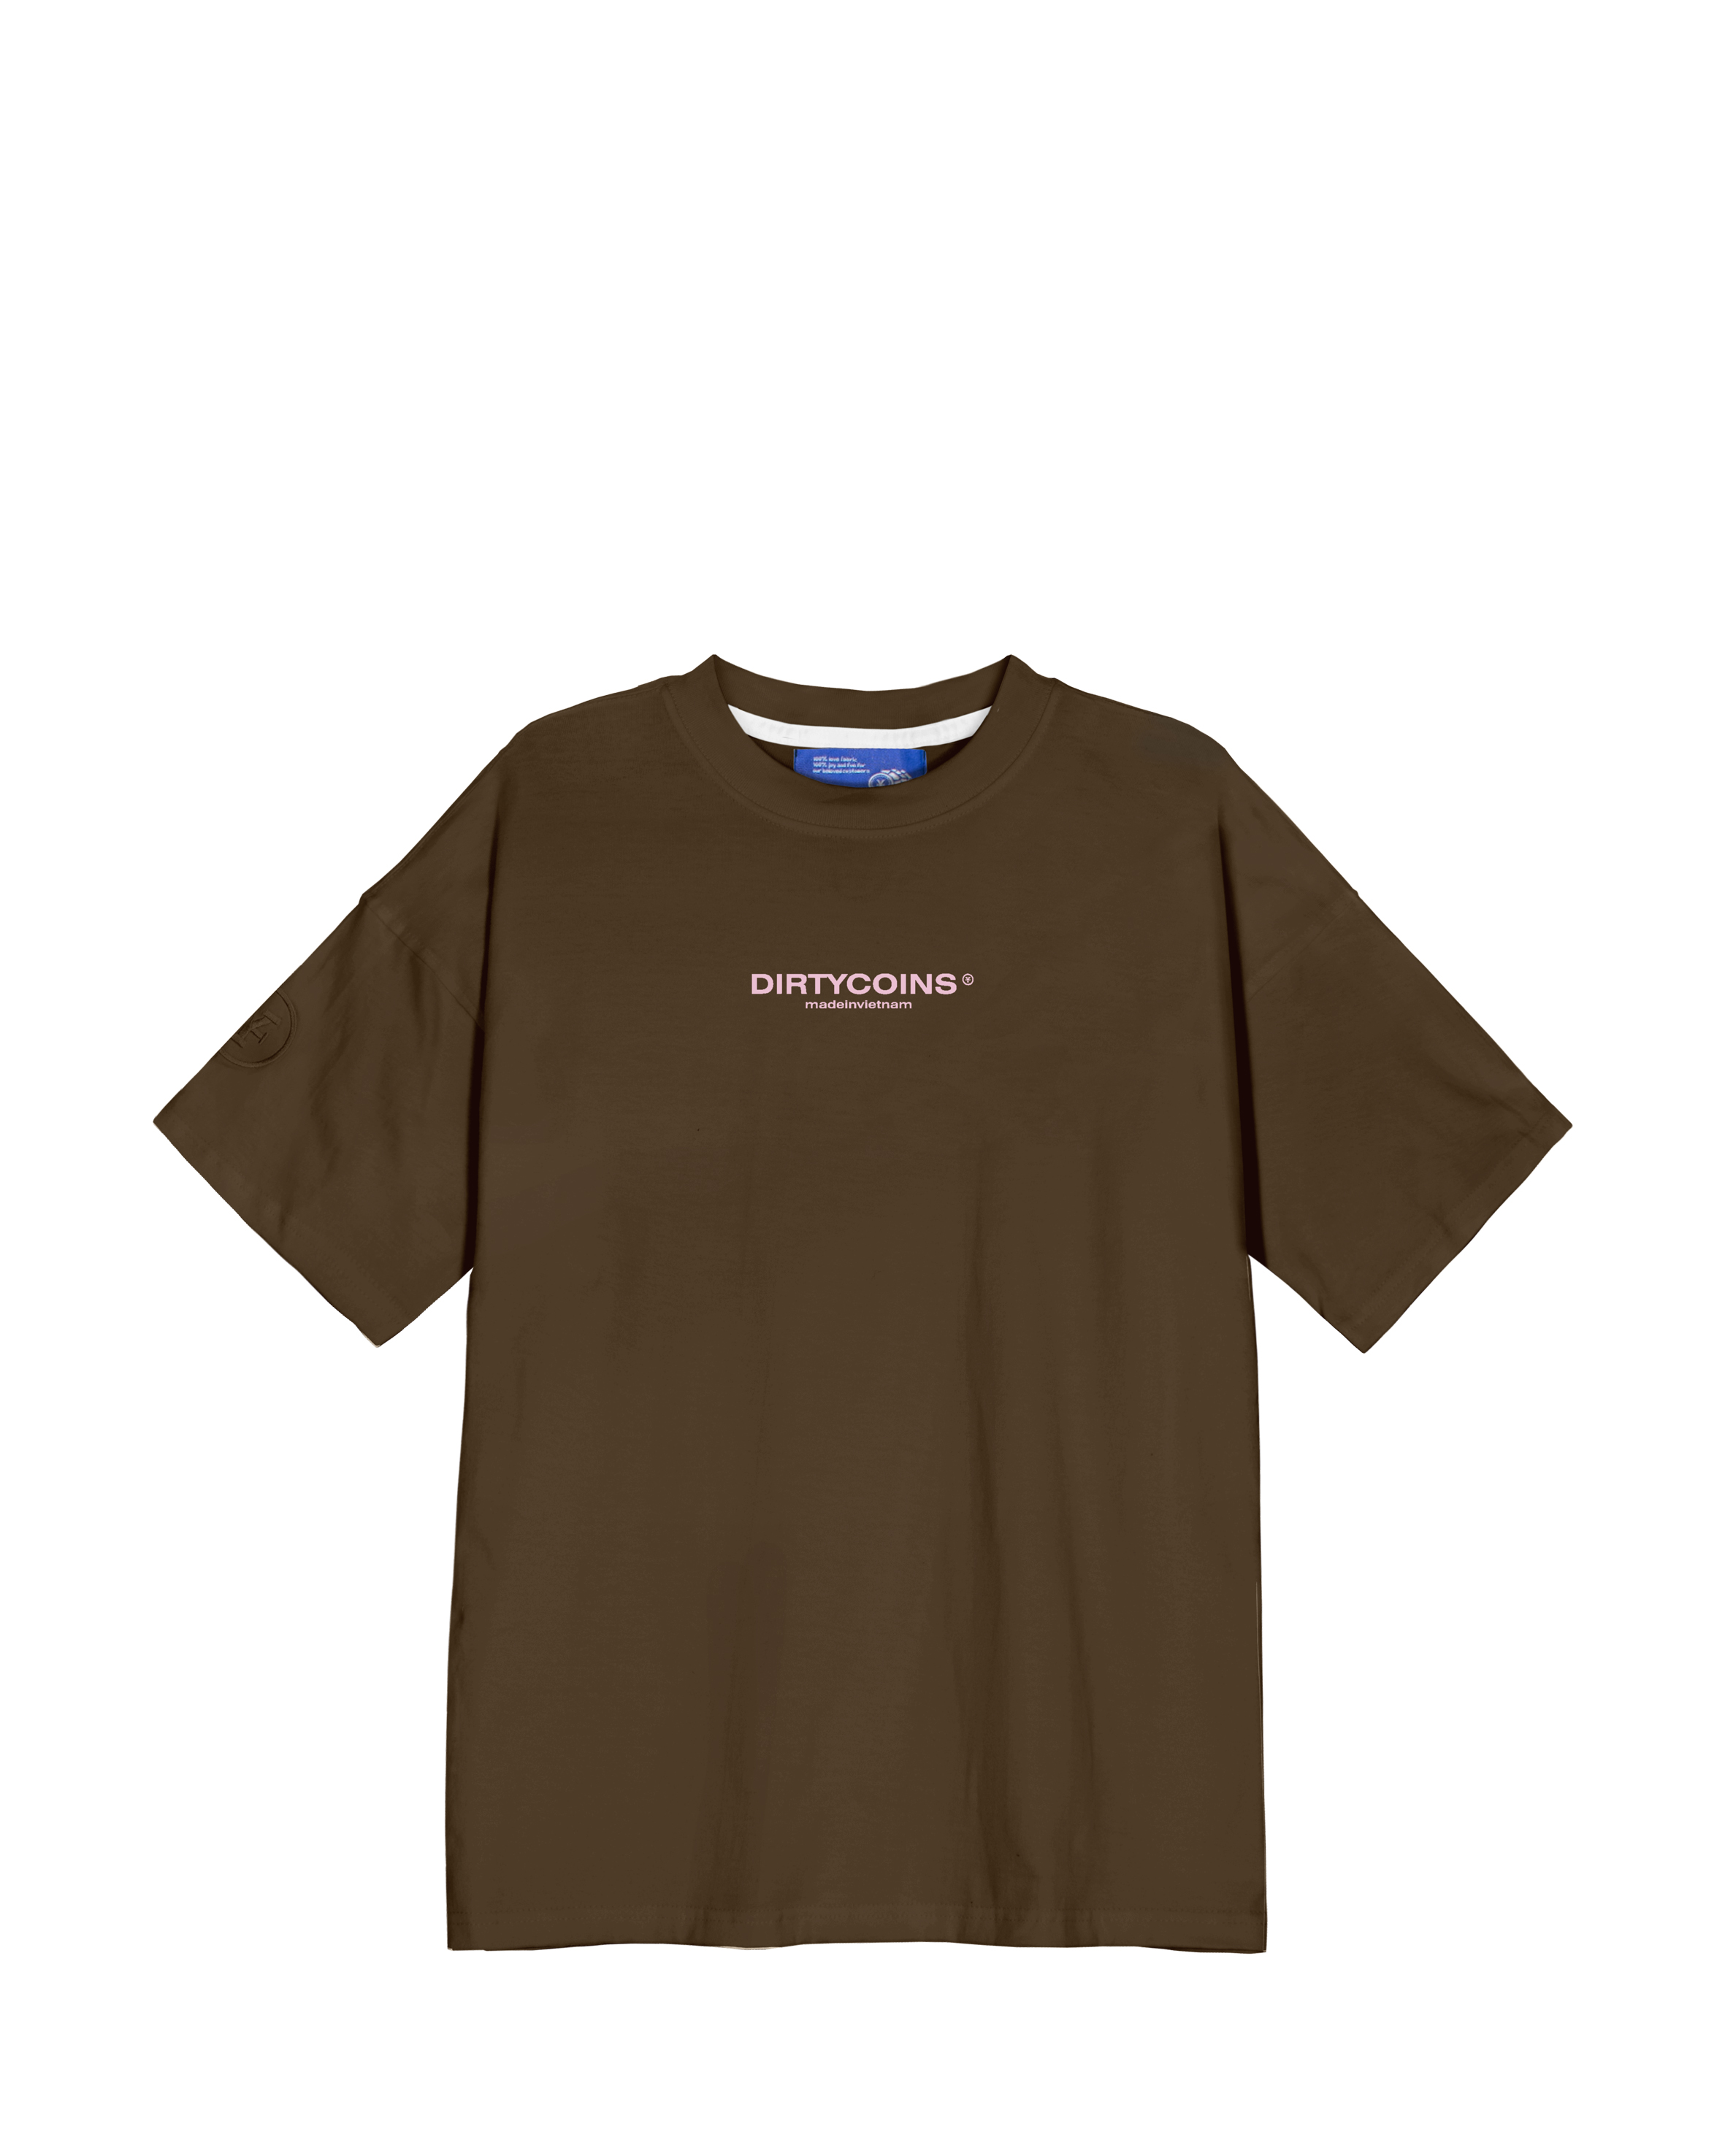 DirtyCoins Bandana T-Shirt - Brown